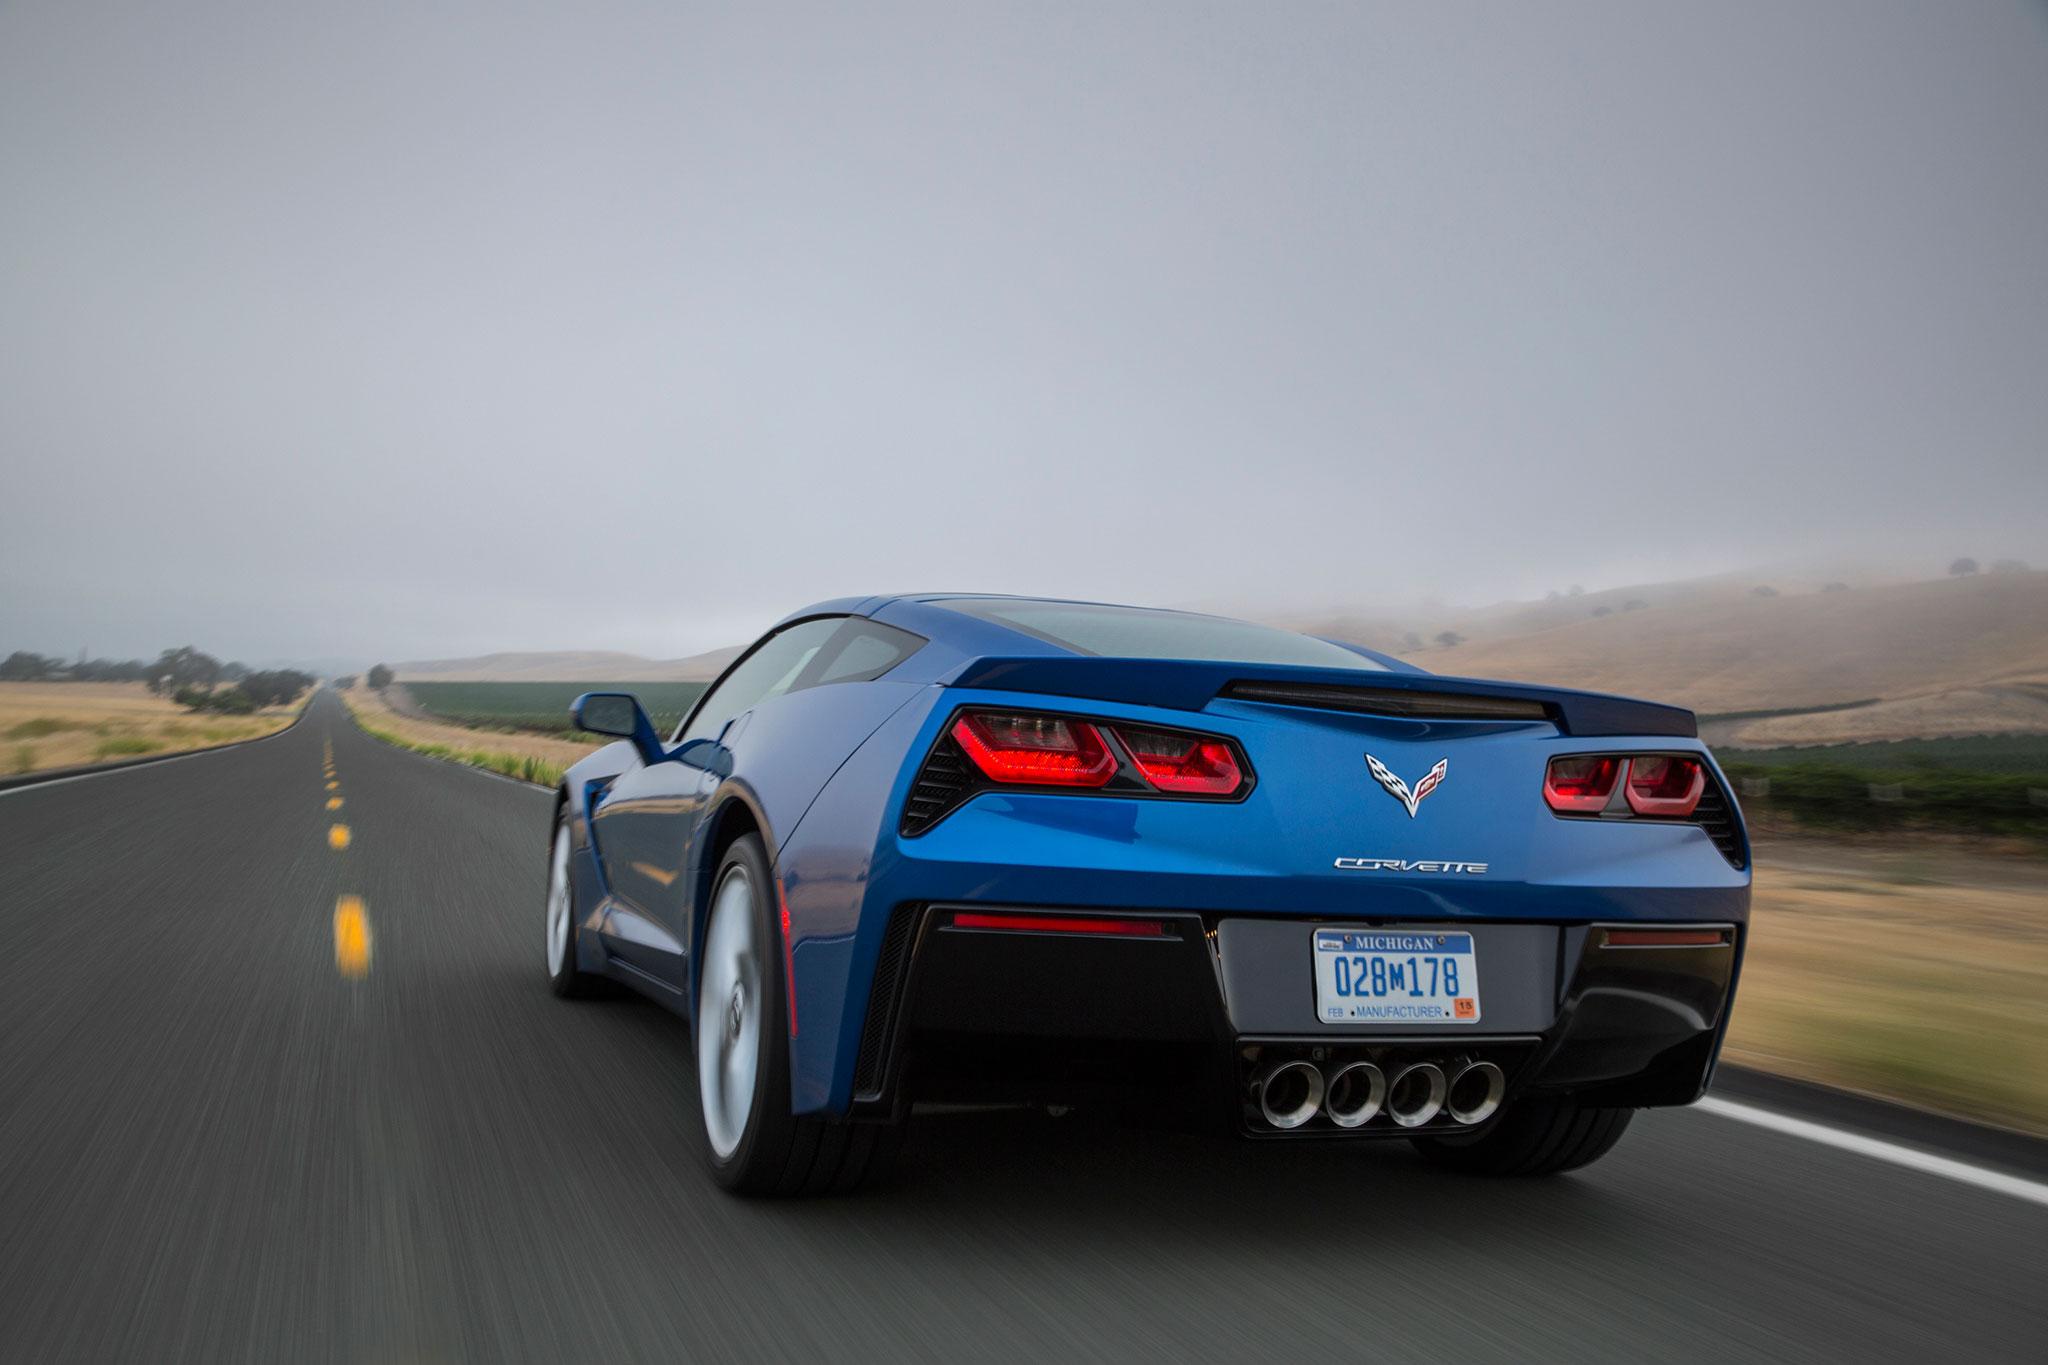 2015 Corvette Stingray Desktop Pics Wallpaper Attachment 1625   Grivu 2048x1365